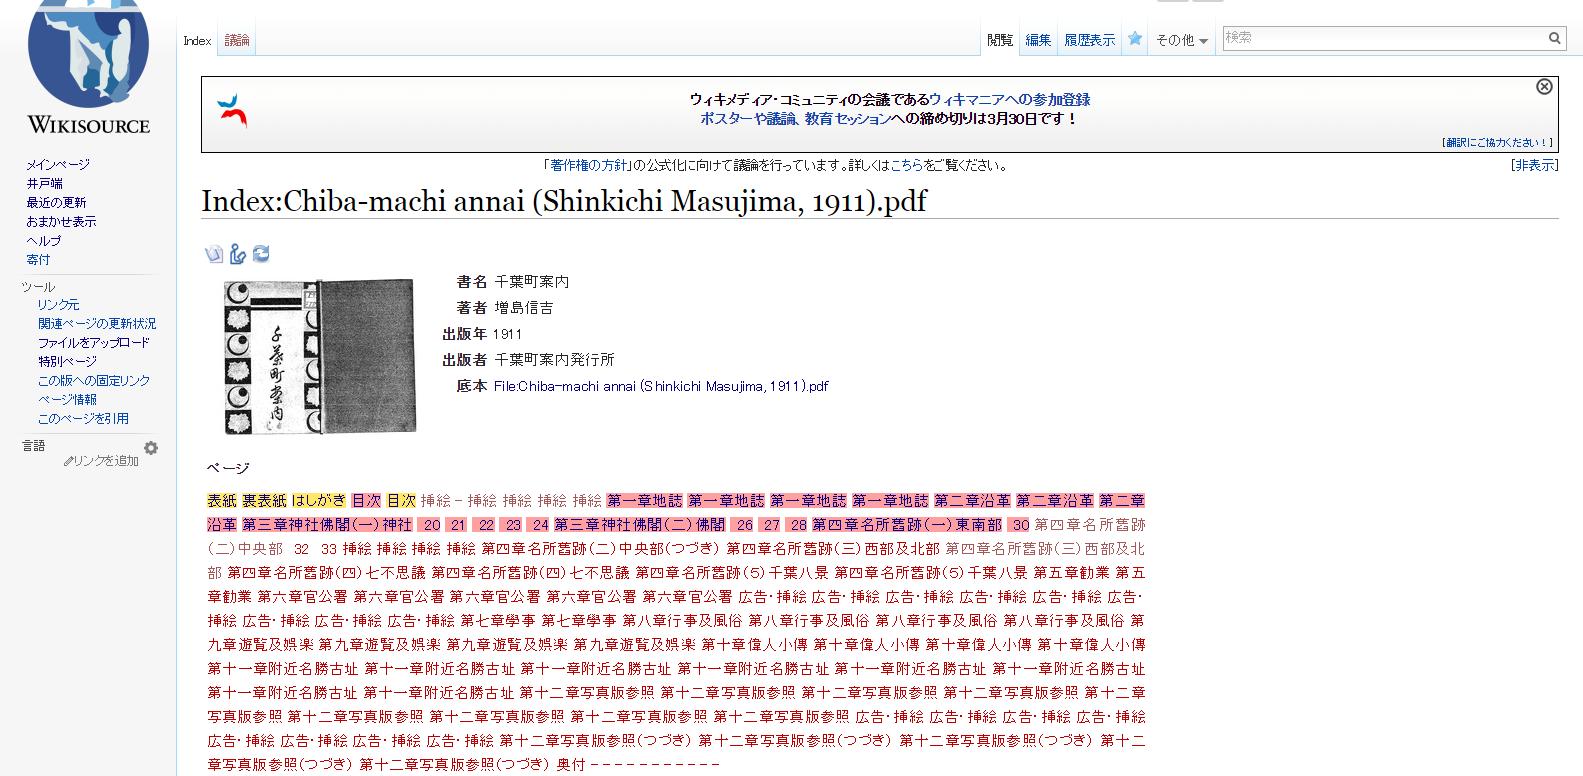 Index Chiba machi annai  Shinkichi Masujima  1911 .pdf   Wikisource.png